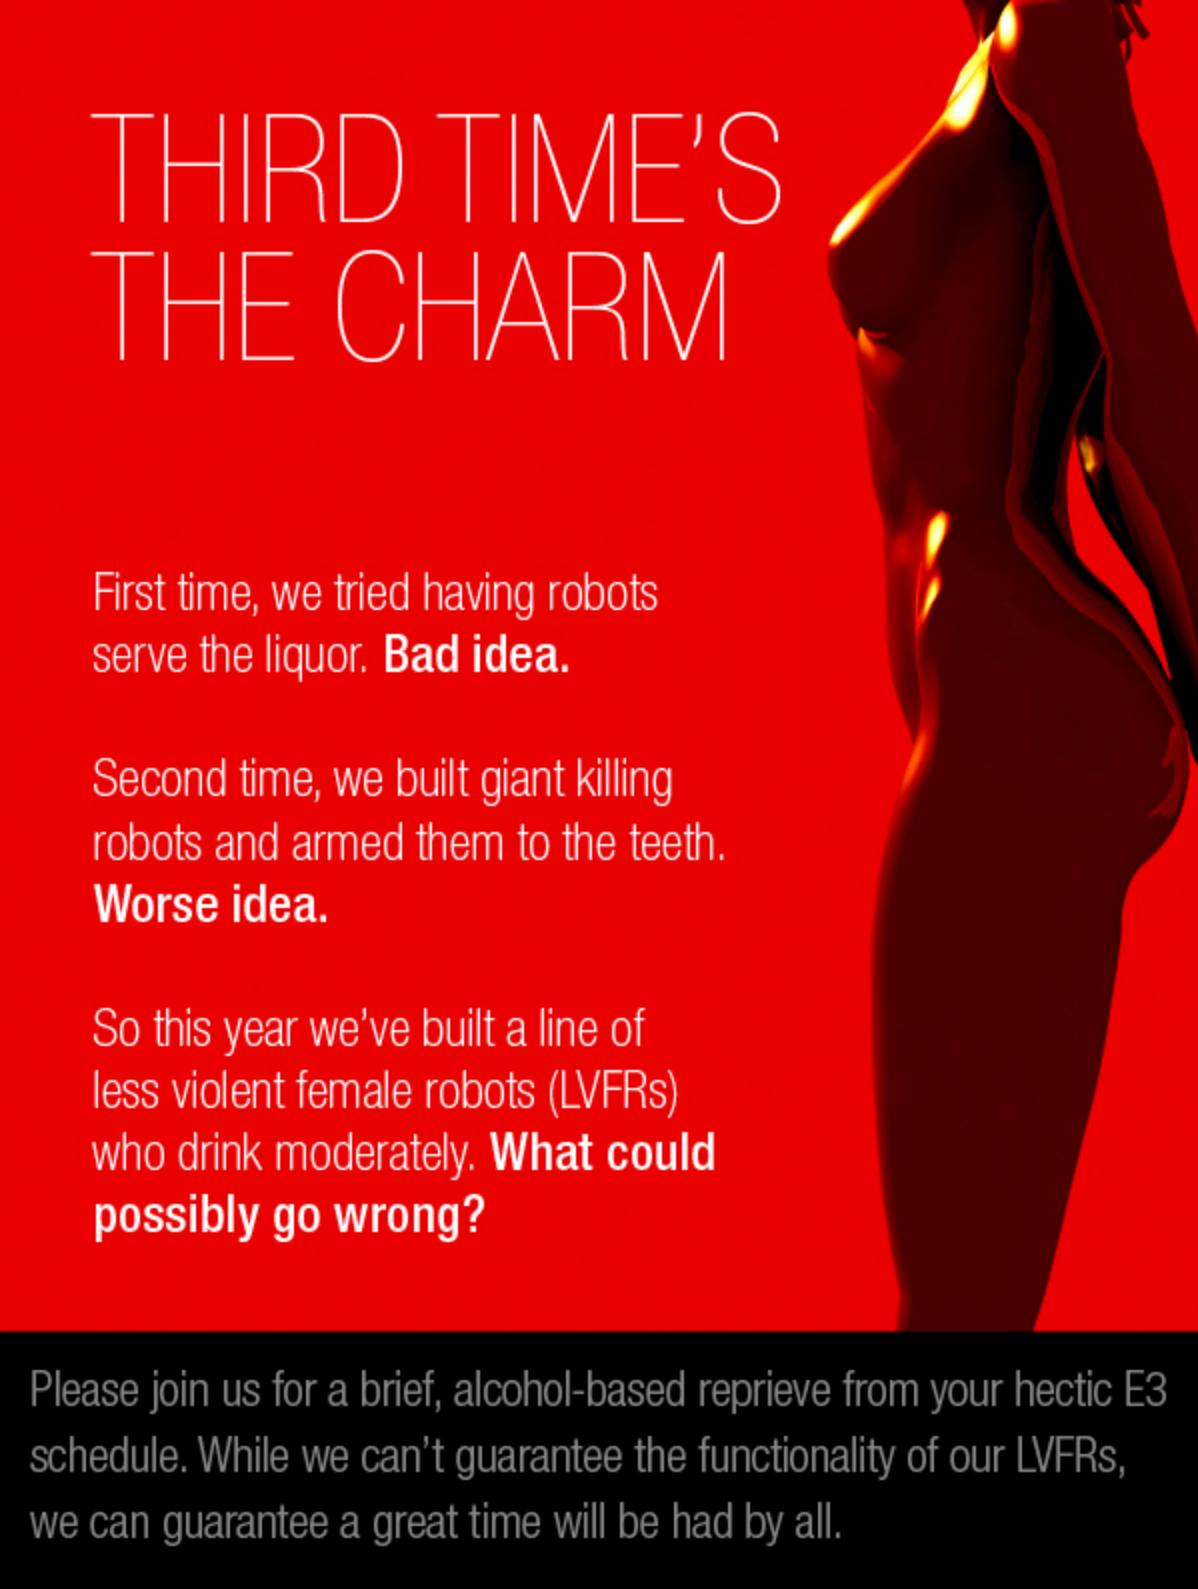 art direction  graphic design  ILLUSTRATION  copywriting  web development  Videogames E3 robots